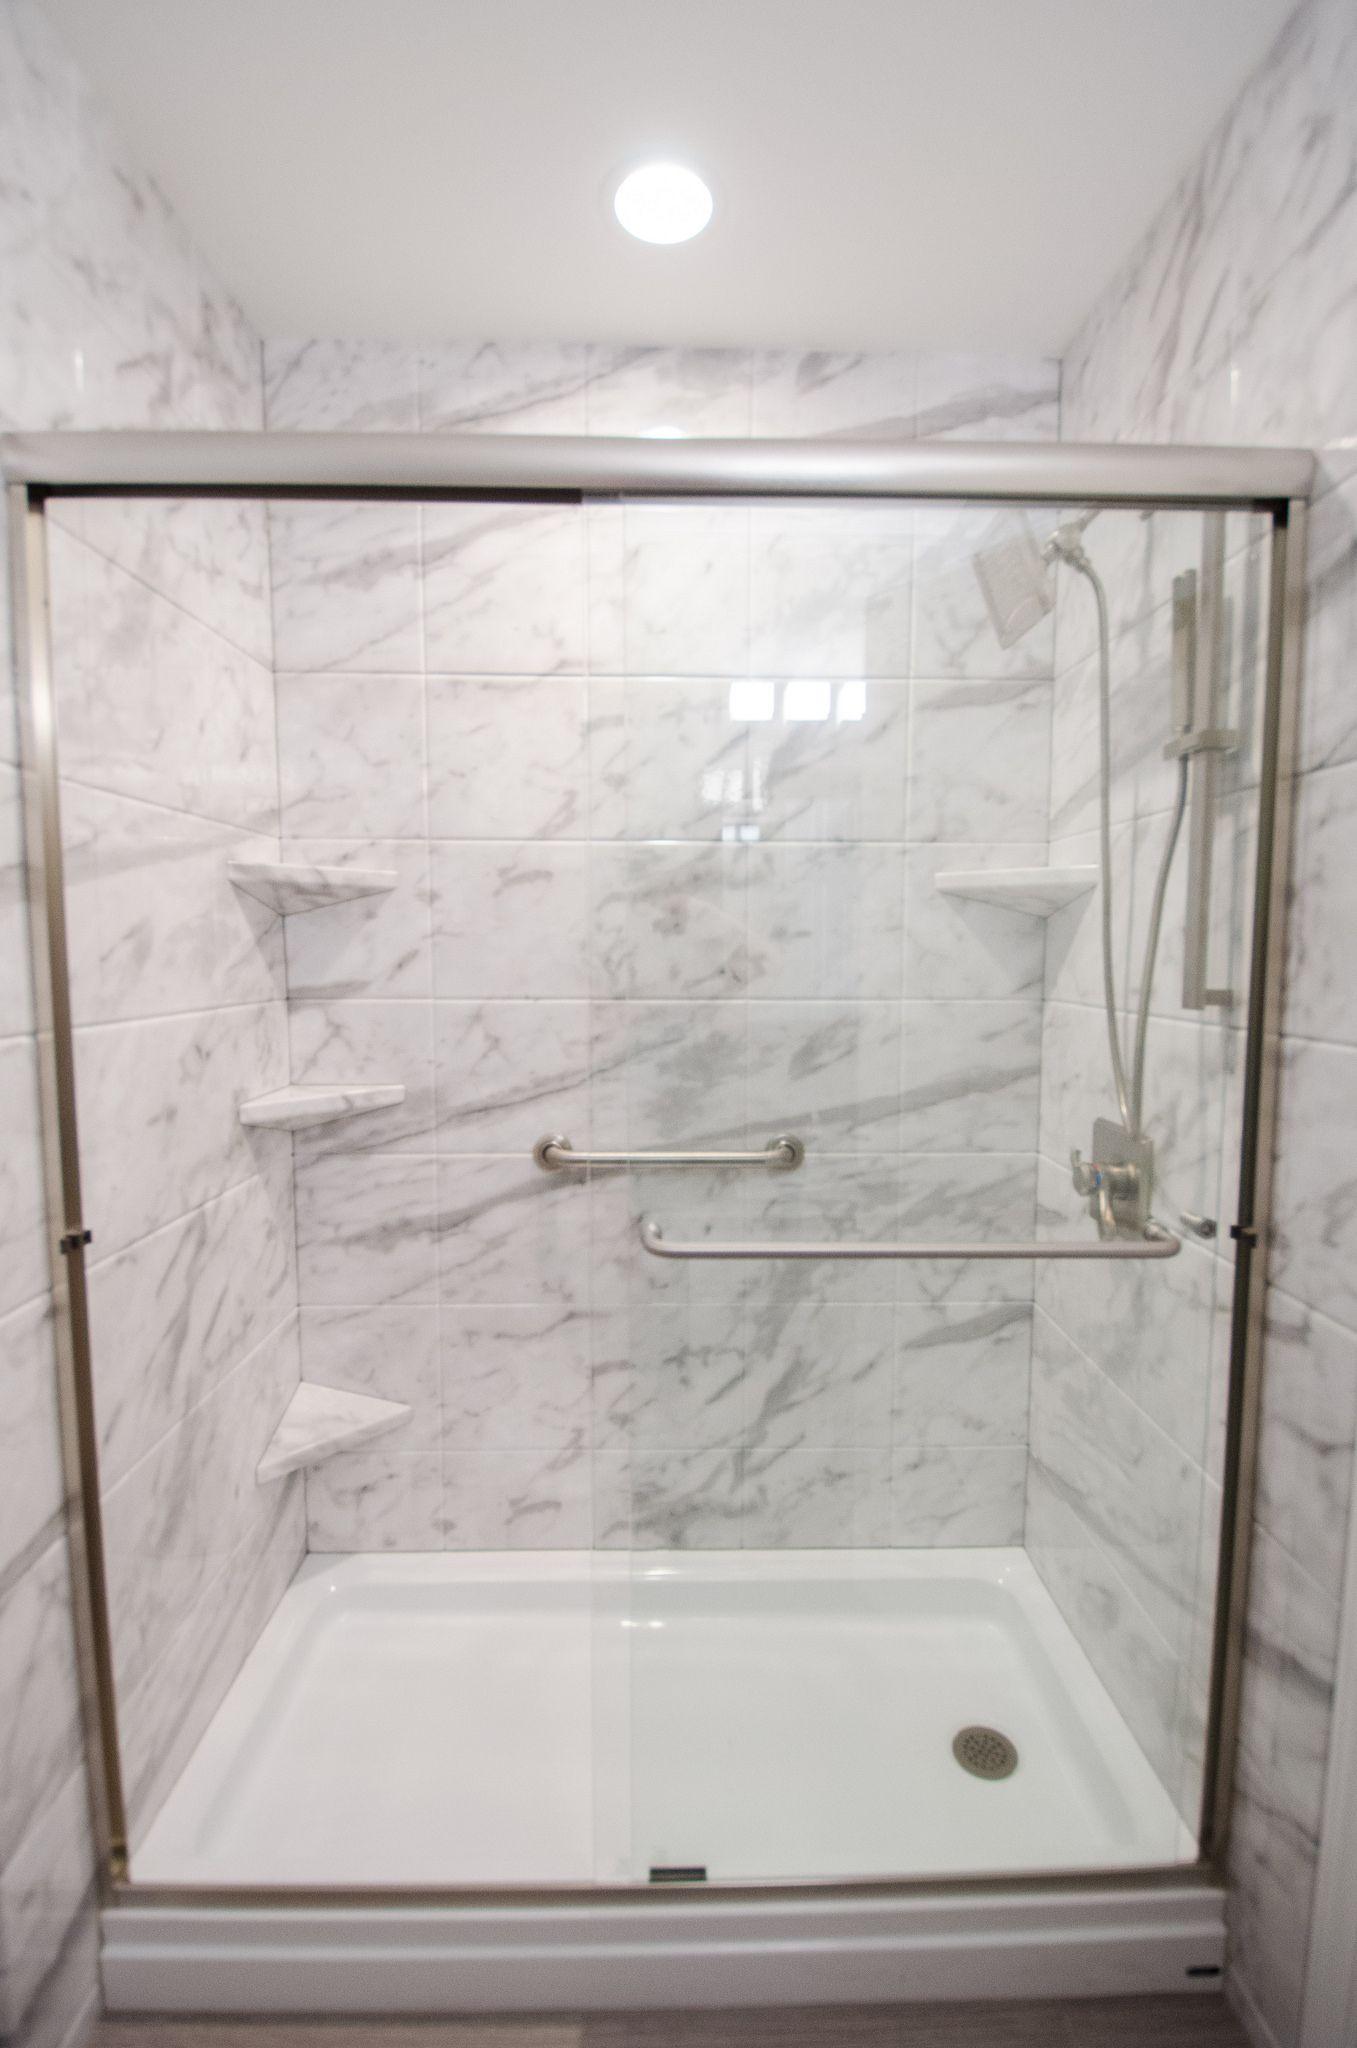 Tub and Shower Combo   Tile Wall Surround   Shower Shelves   Glass Shower    OversizedRH849   After 0105   Sliding glass door  Glass doors and Tubs. Tub Shower Combo Glass Doors. Home Design Ideas